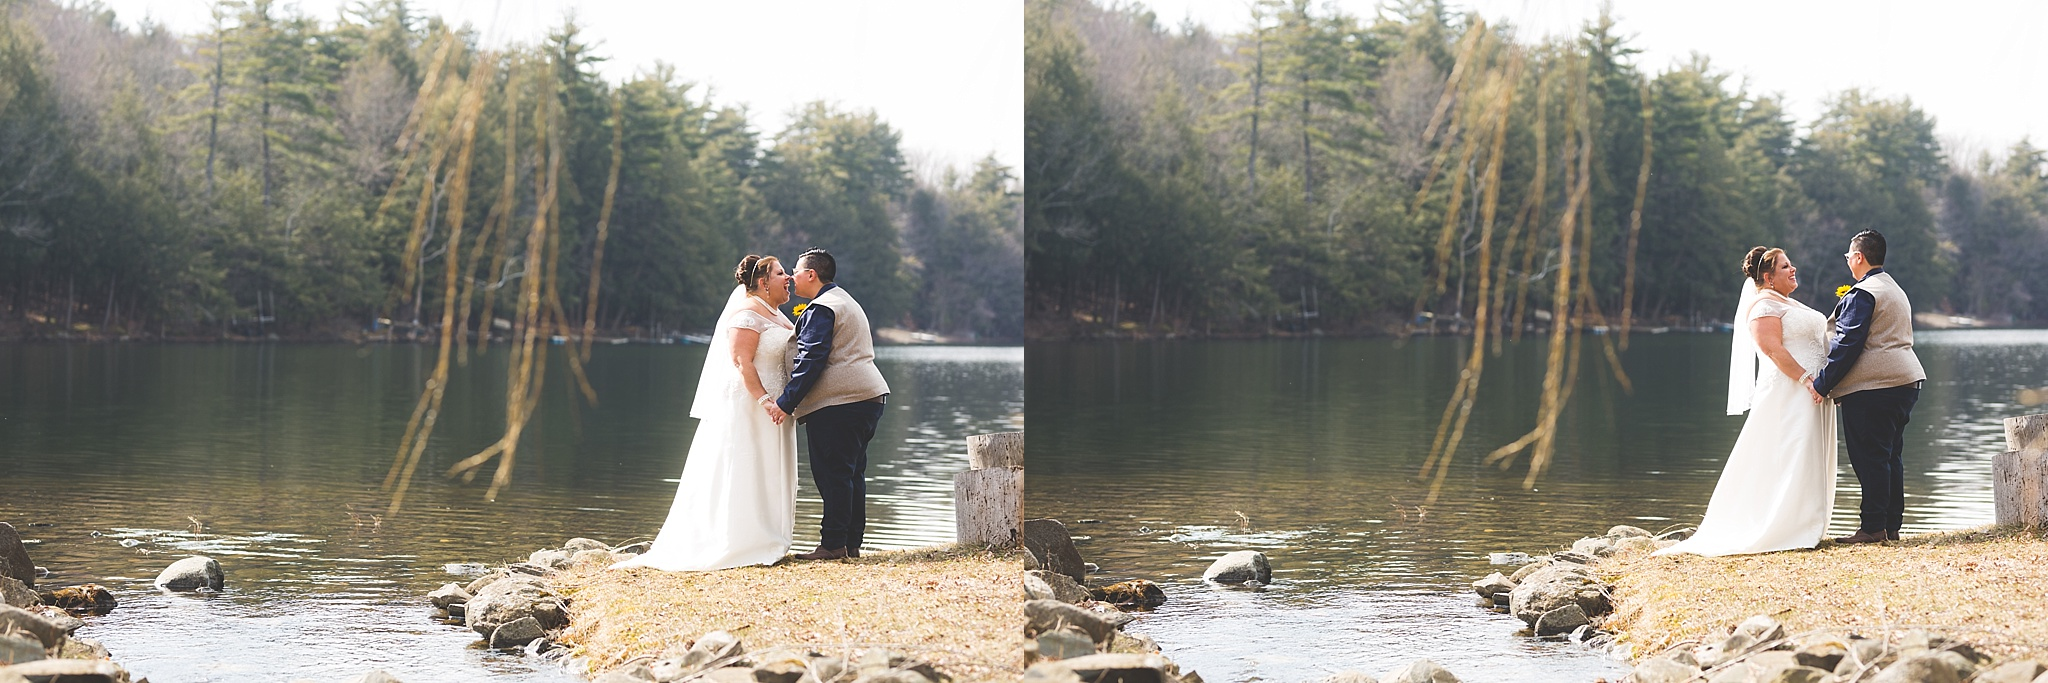 Albany_Wedding_Photographer_1651.jpg